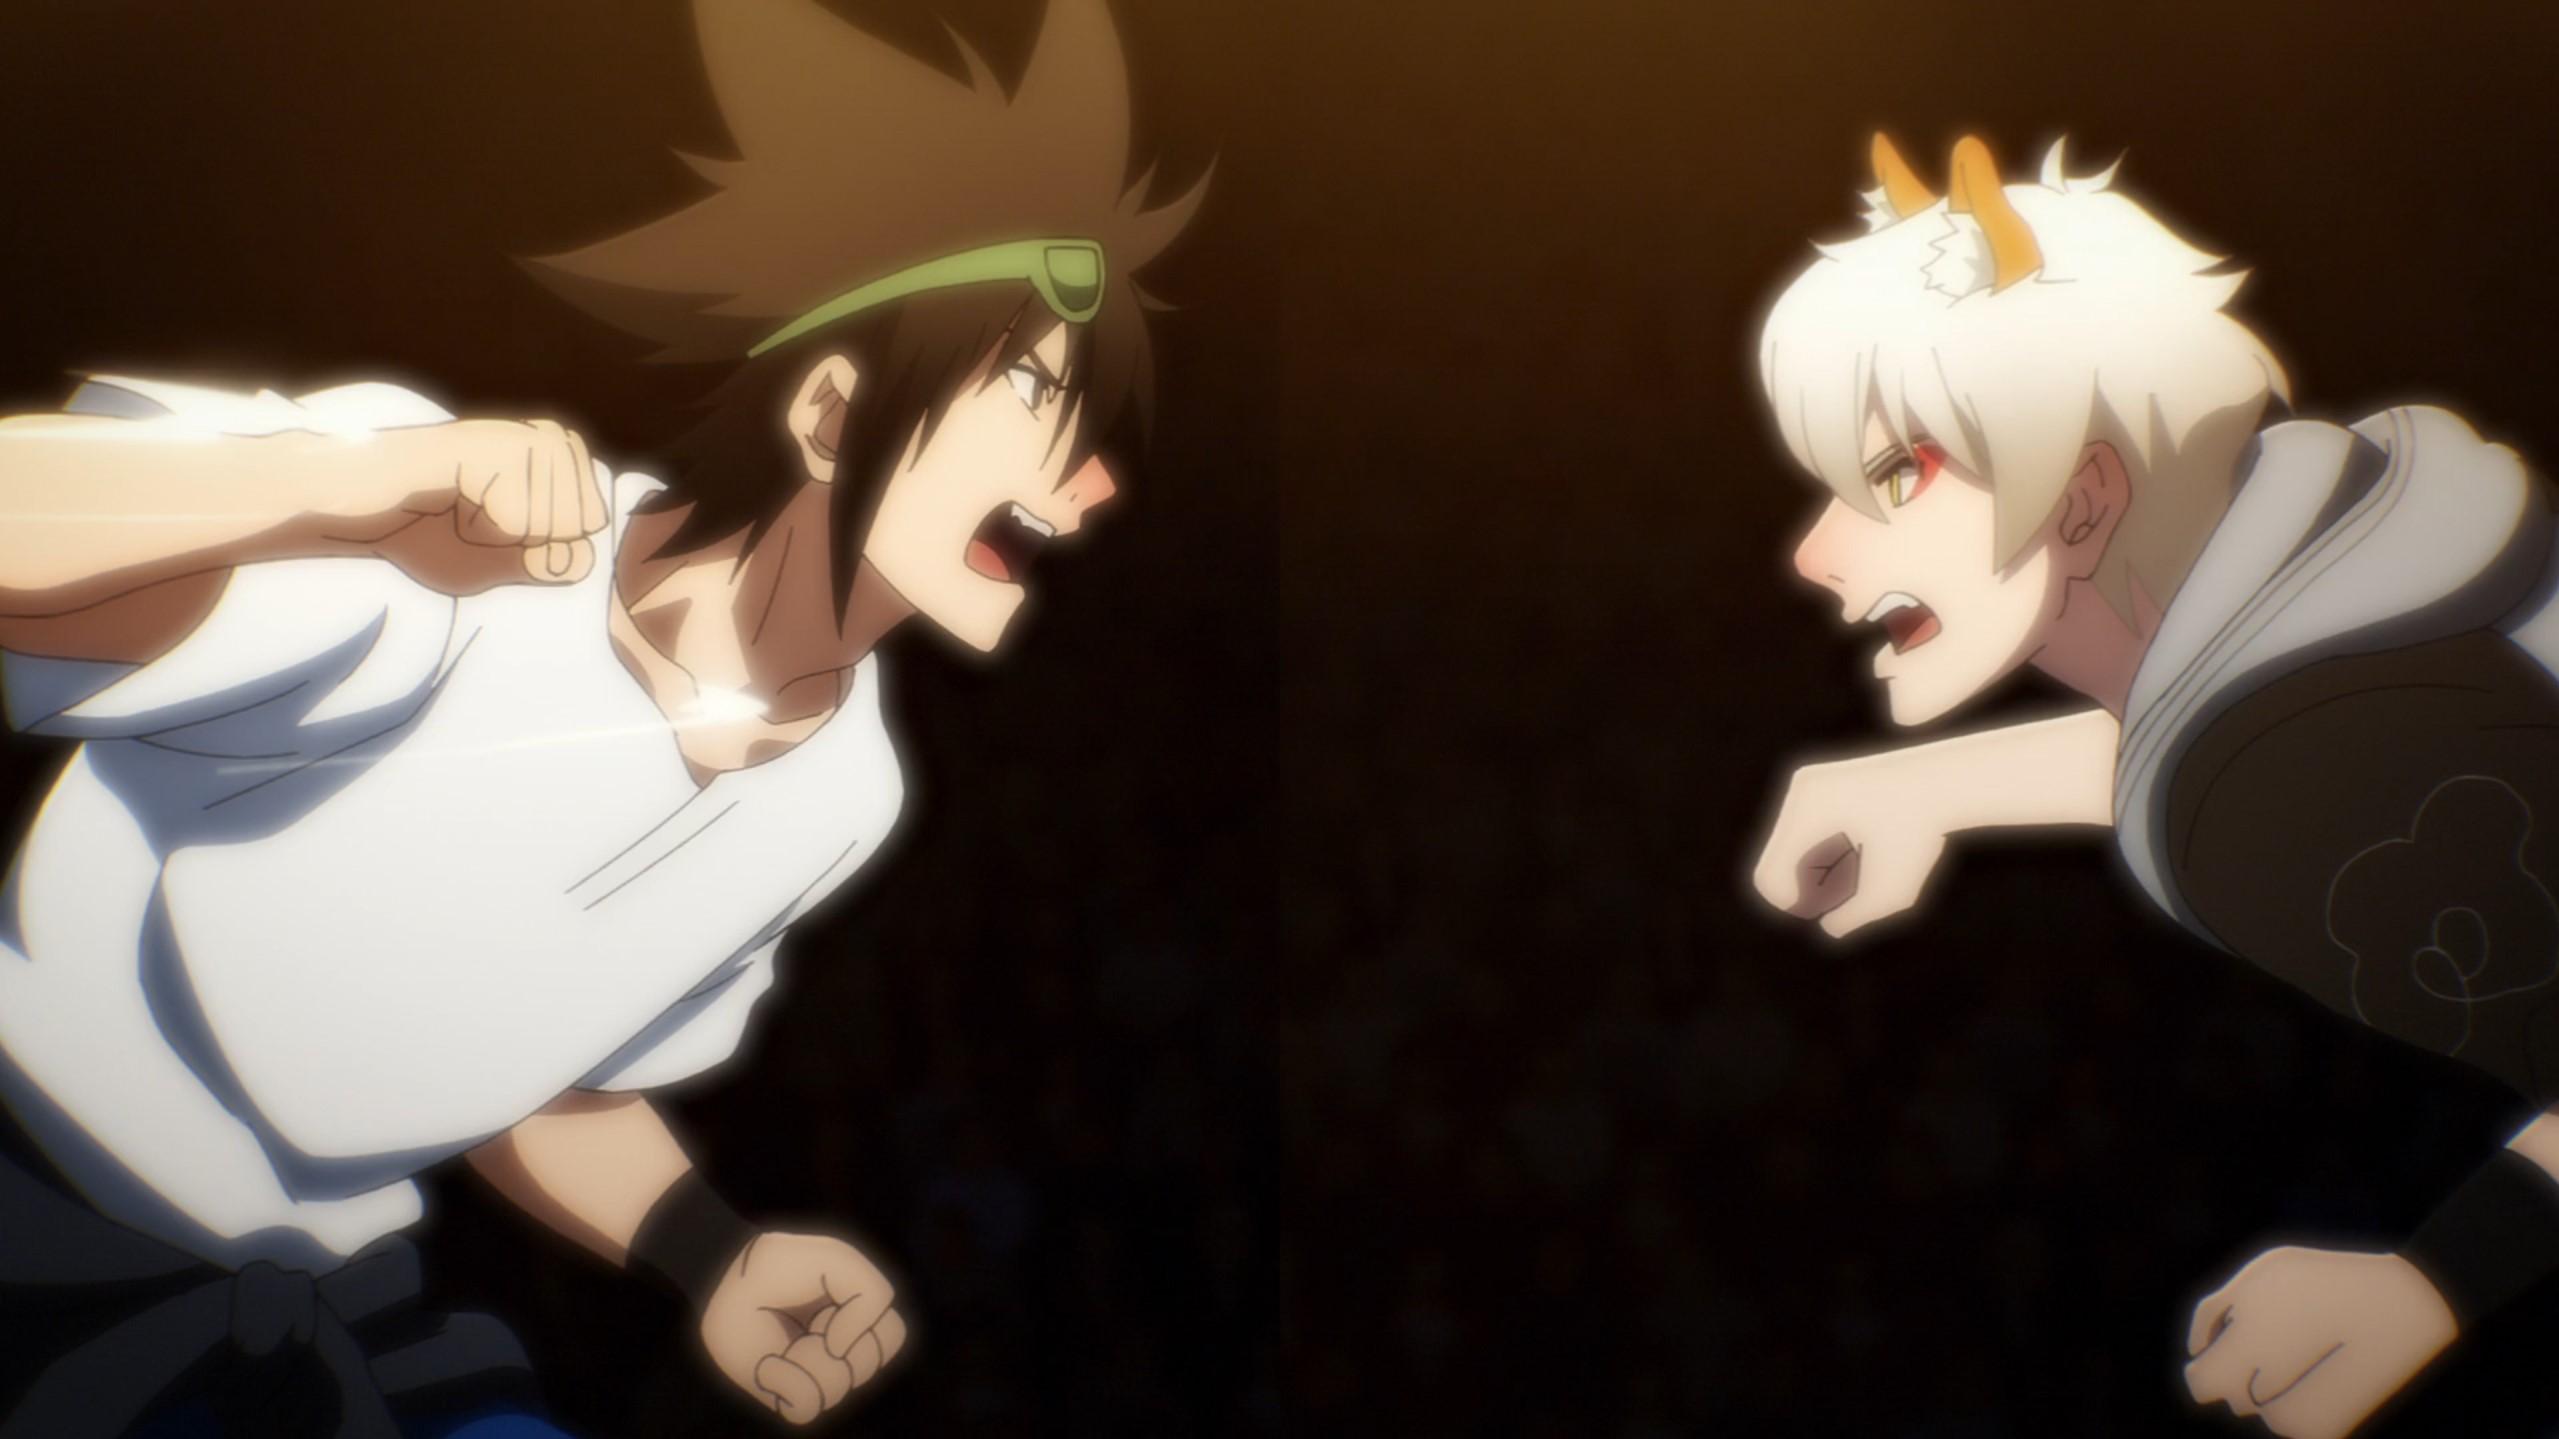 Mori vs Ilpyo